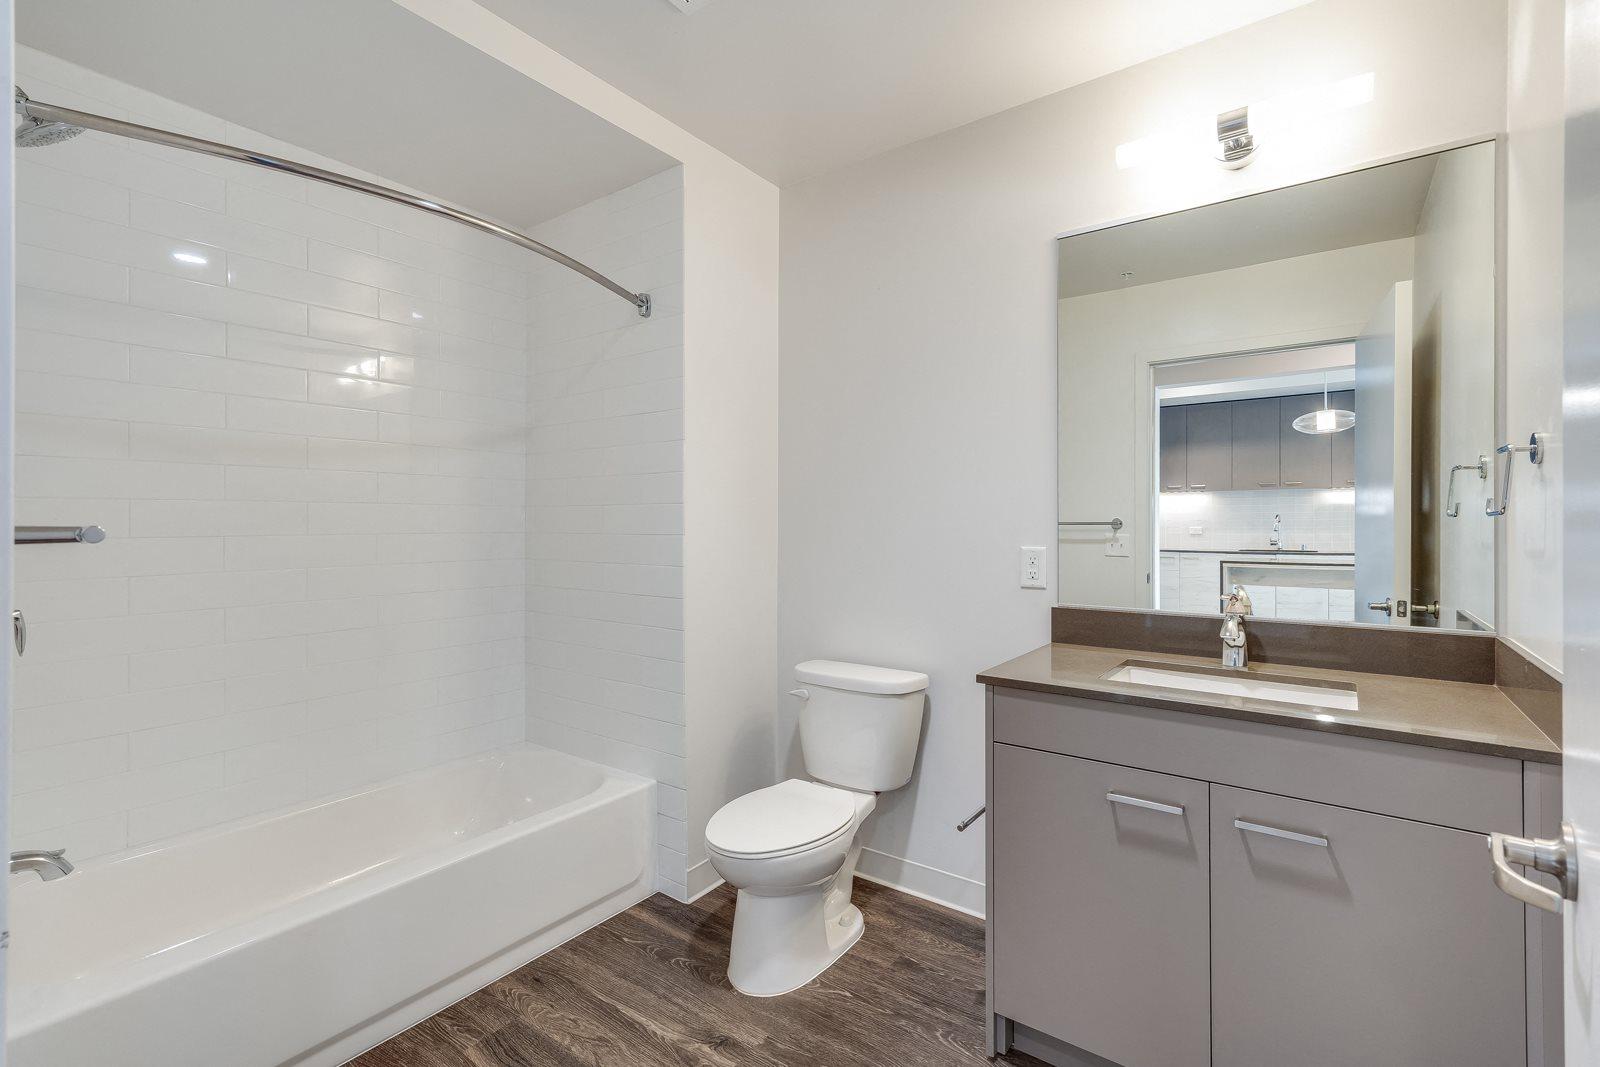 Ceramic Tiled Tub/Showers at Mission Bay by Windsor, 94158, CA